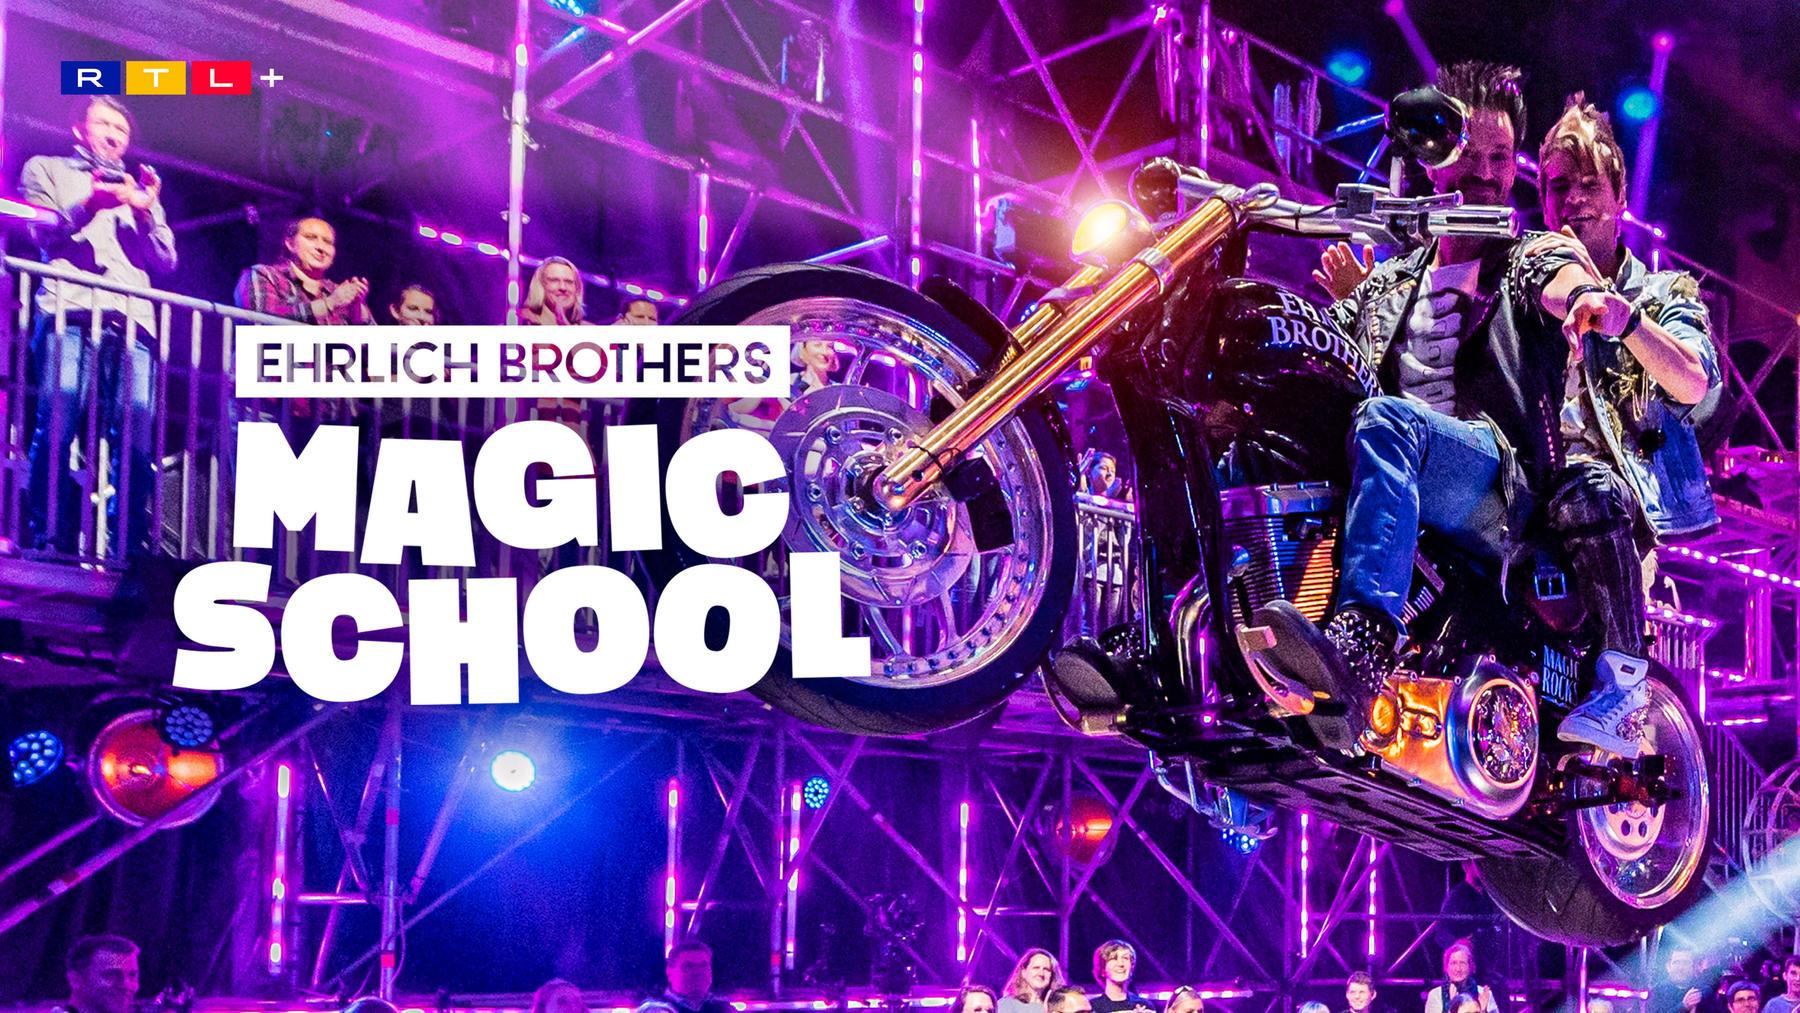 Die Ehrlich Brothers Magic School